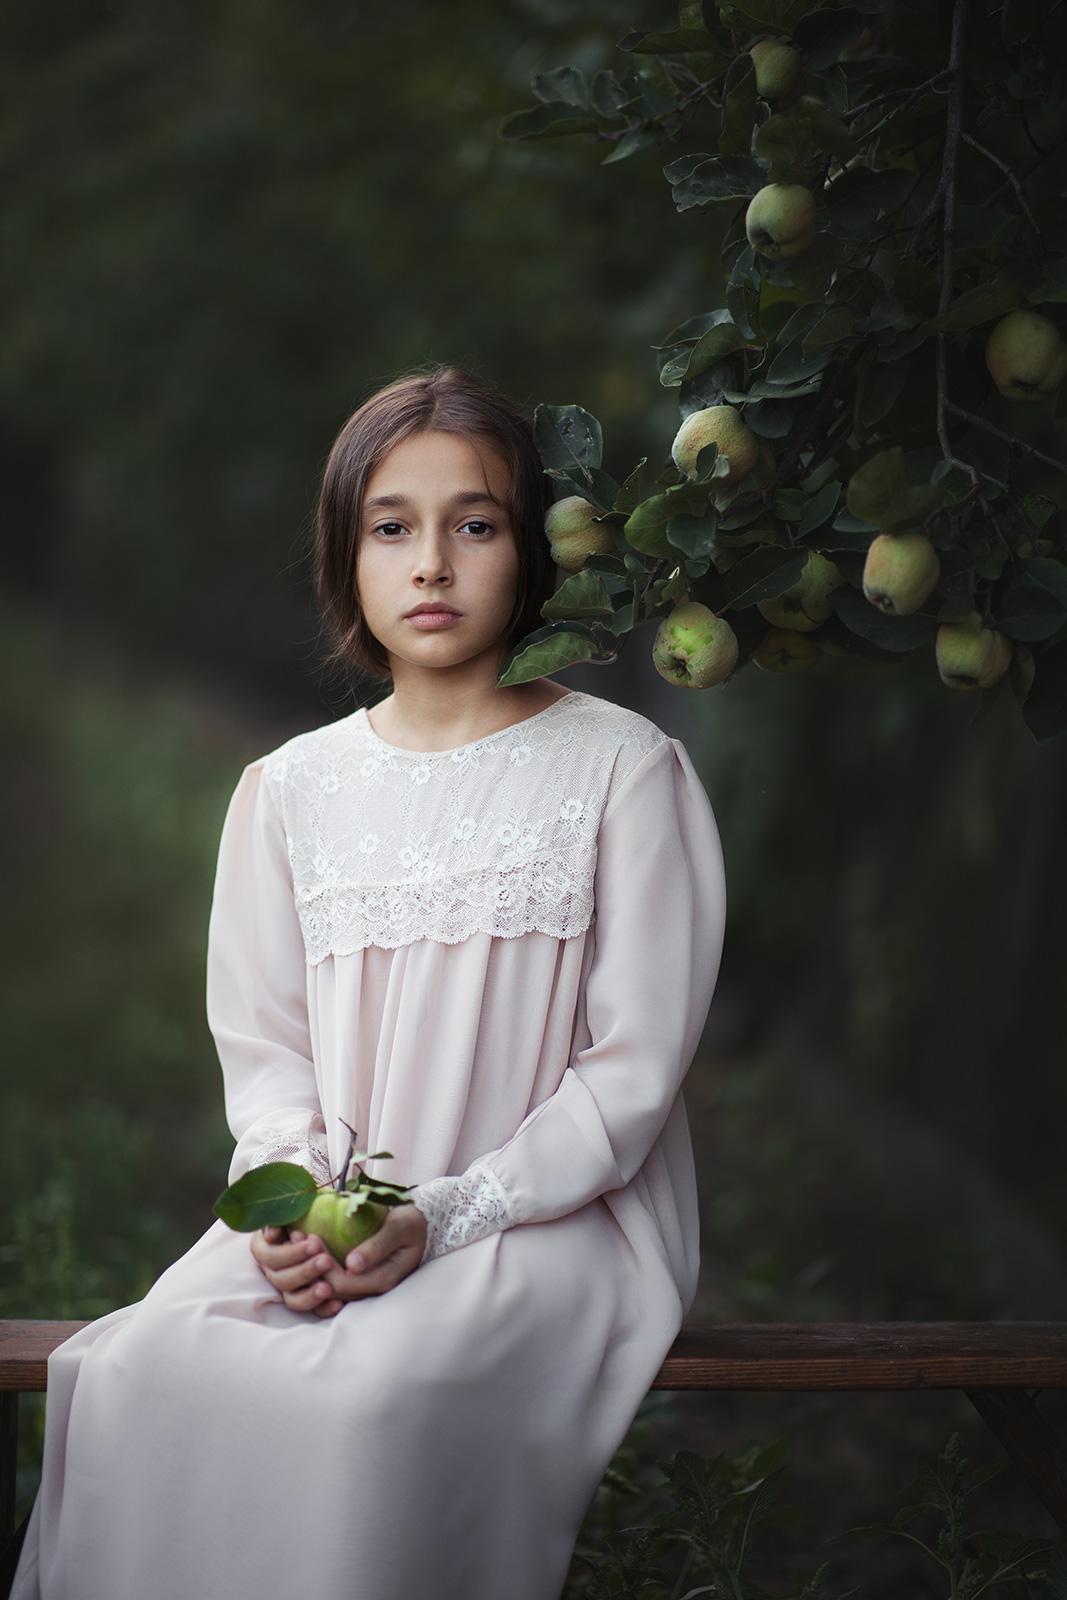 fotograf-portret-brasov-bucuresti-01